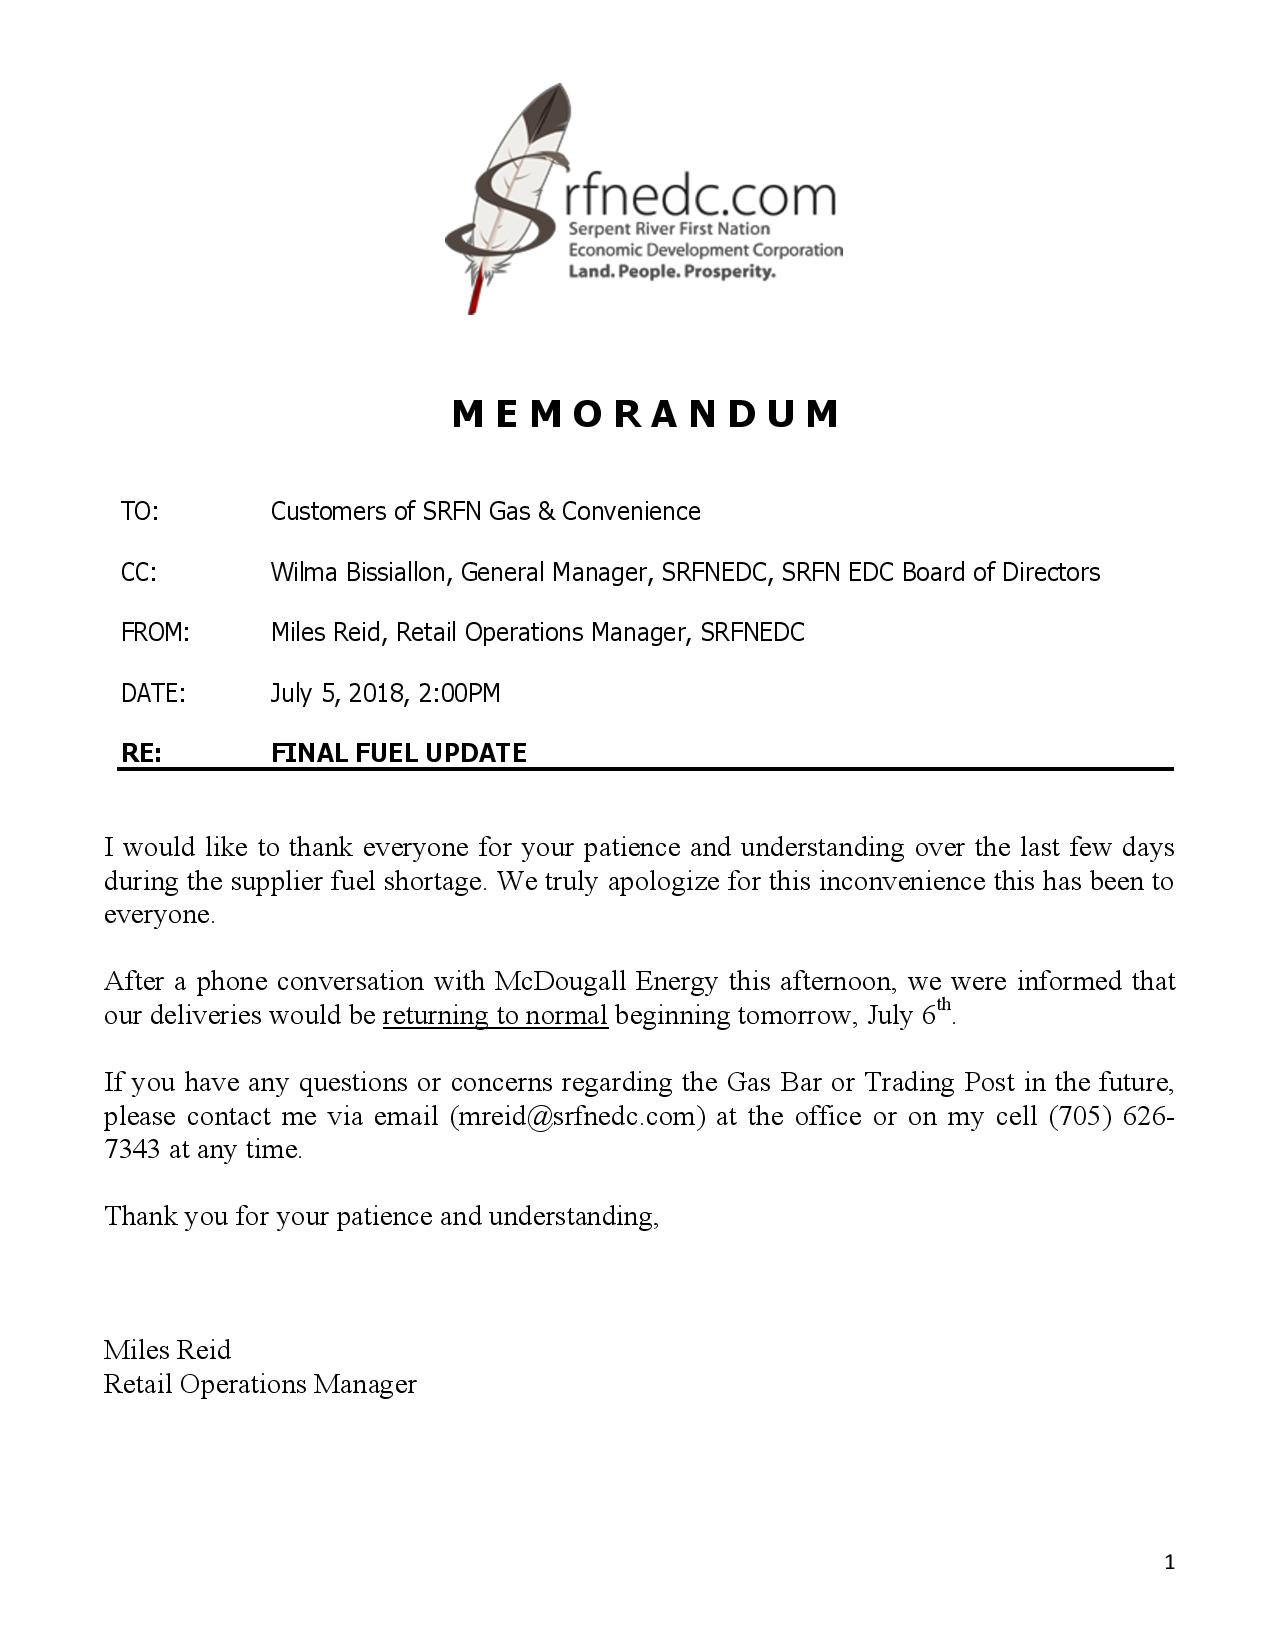 FINAL Fuel Update July 5-page-001.jpg